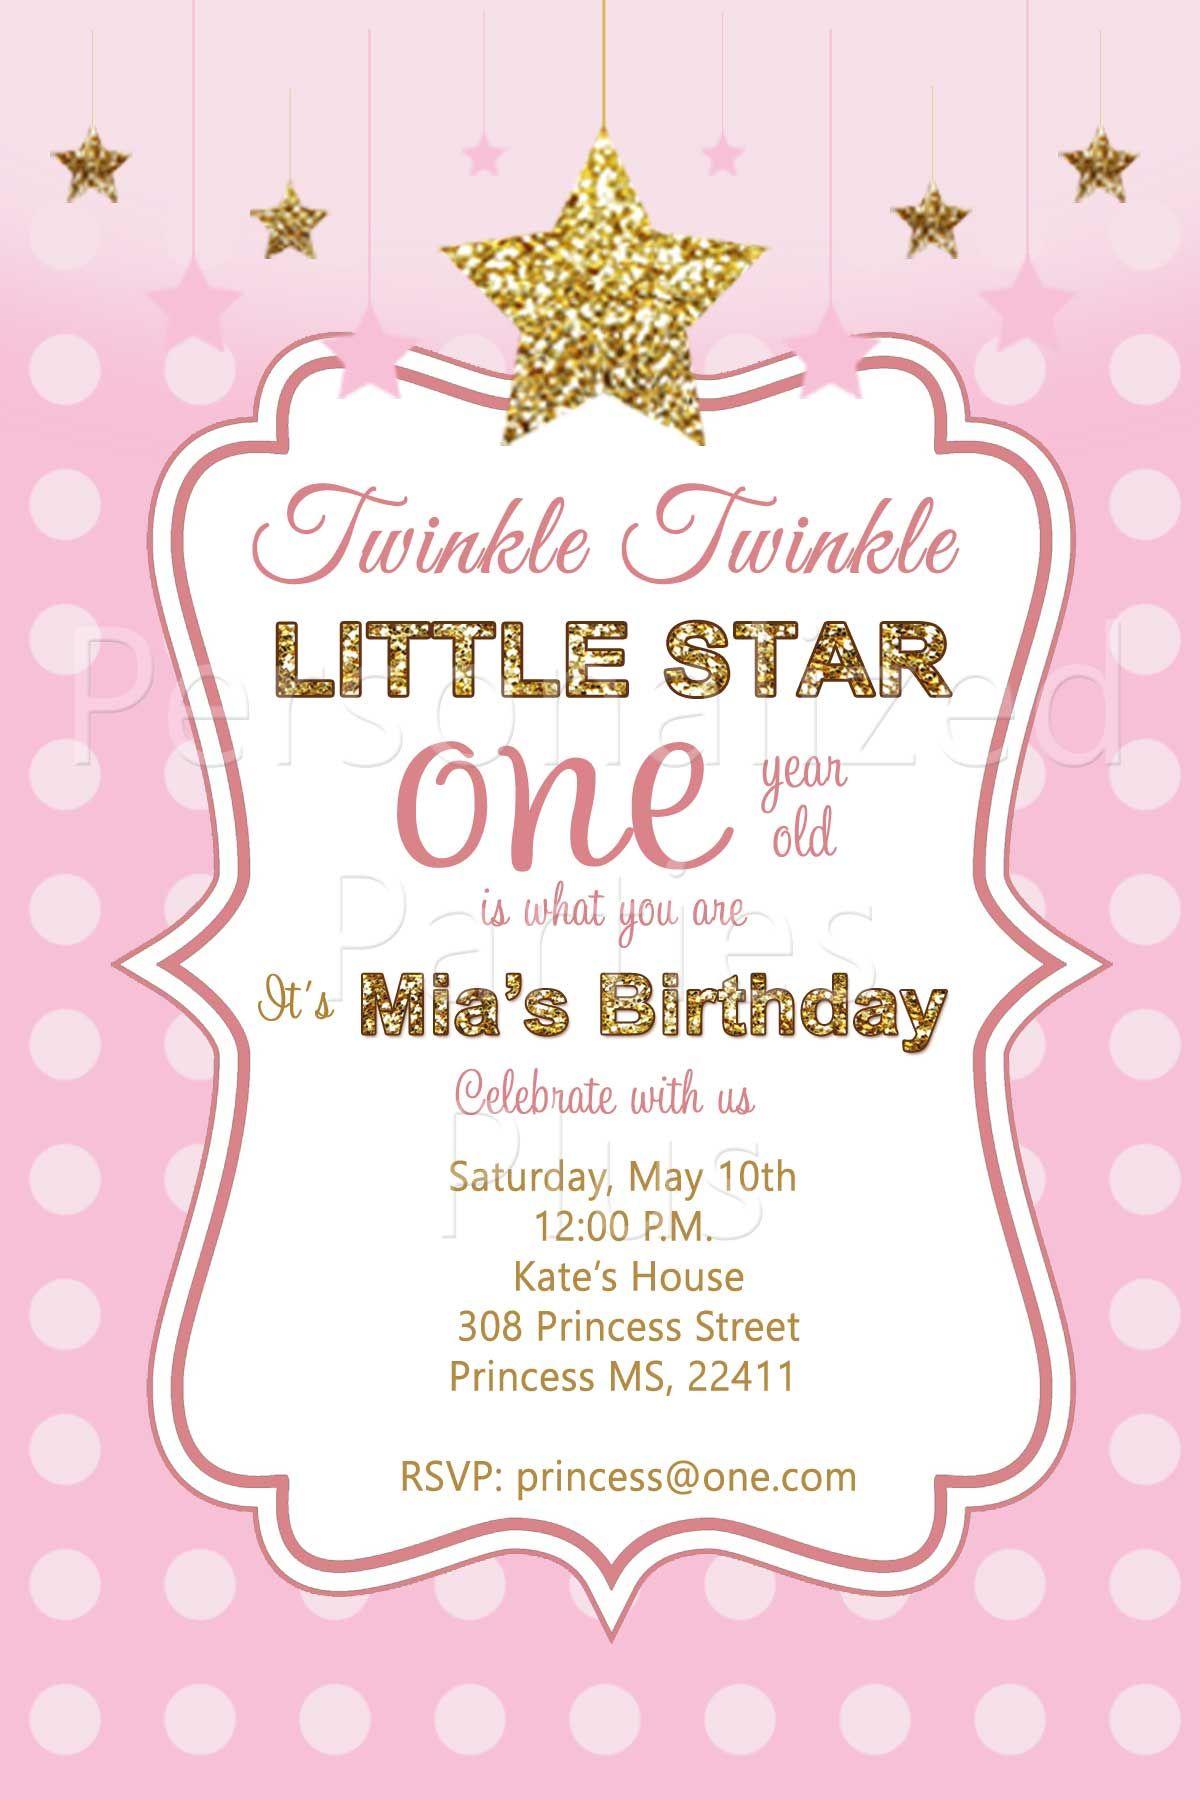 Image Result For Twinkle Twinkle Invitation Birthday Invitations Girl 1st Birthday Invitations Birthday Invitations